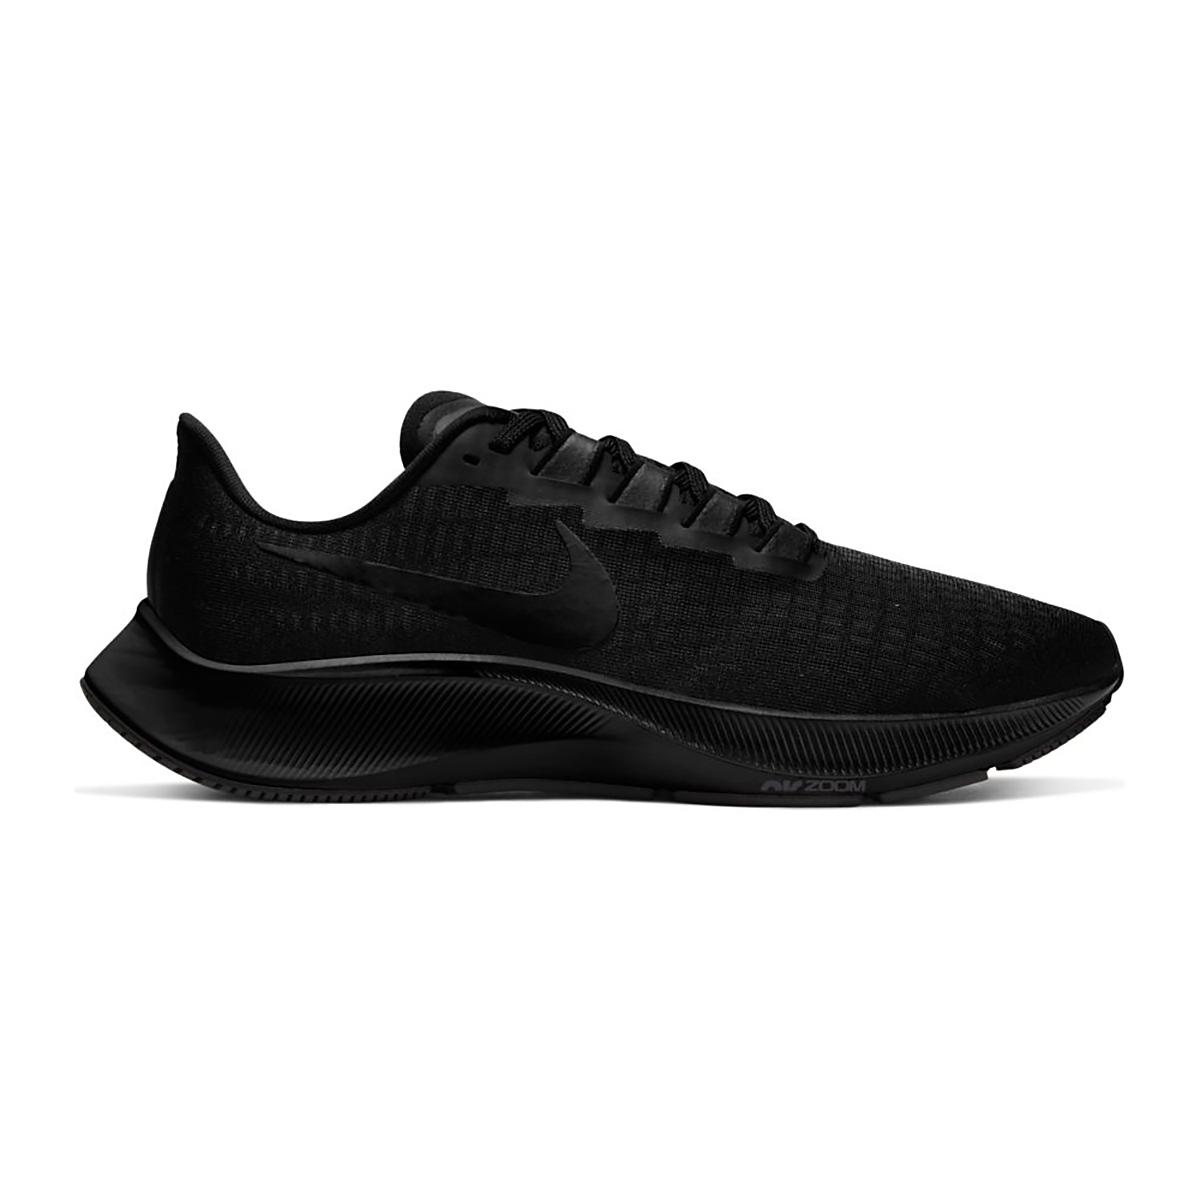 Men's Nike Nike Air Zoom Pegasus 37 Running Shoe - Color: Black/Black/Smoke Grey - Size: 6.5 - Width: Regular, Black/Black/Smoke Grey, large, image 1